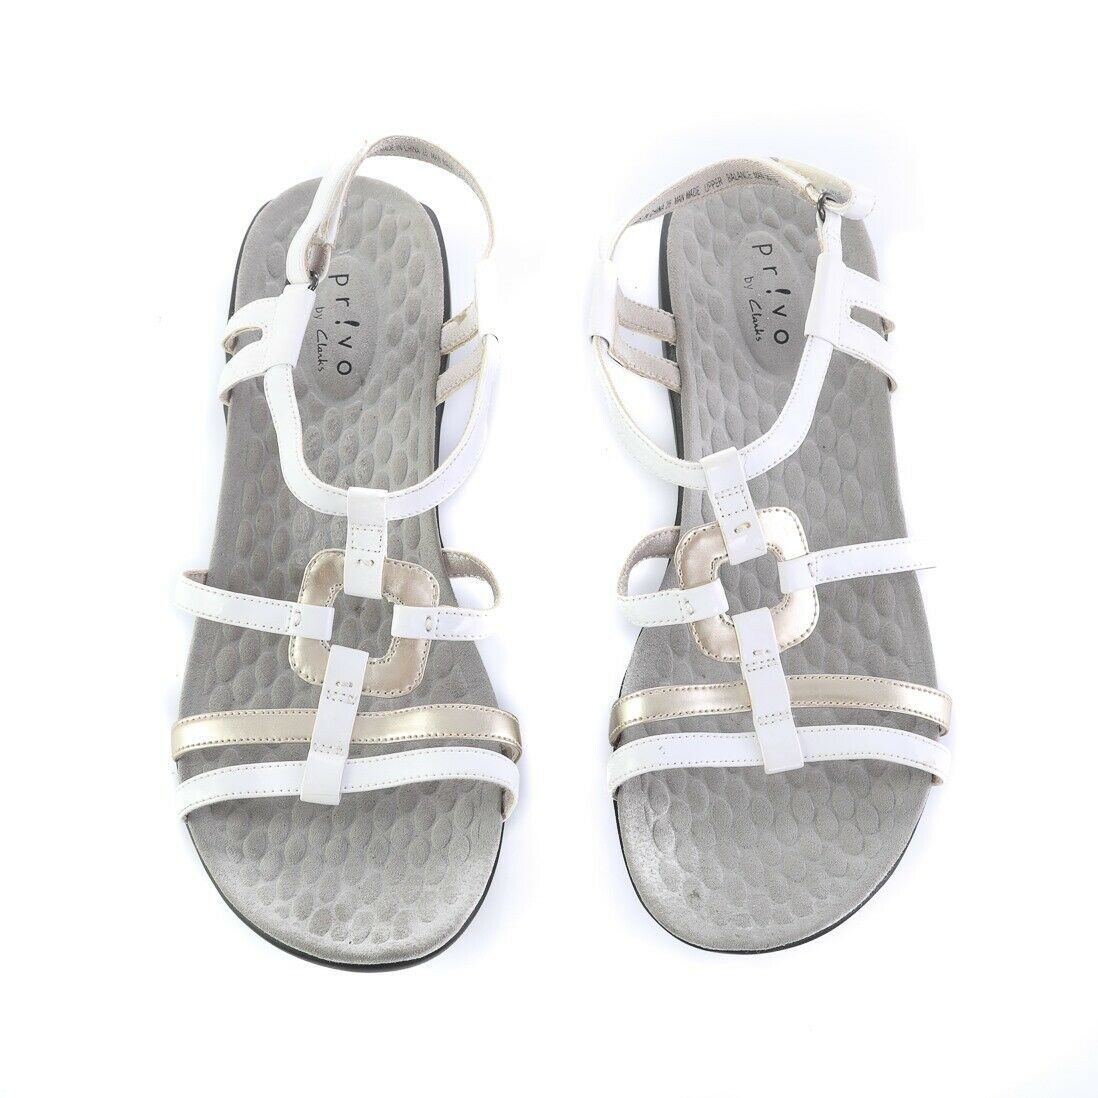 B Keen Bali Strap Size US 7 M EU 37.5 Women/'s Sport Sandals Shoes Dress Blue